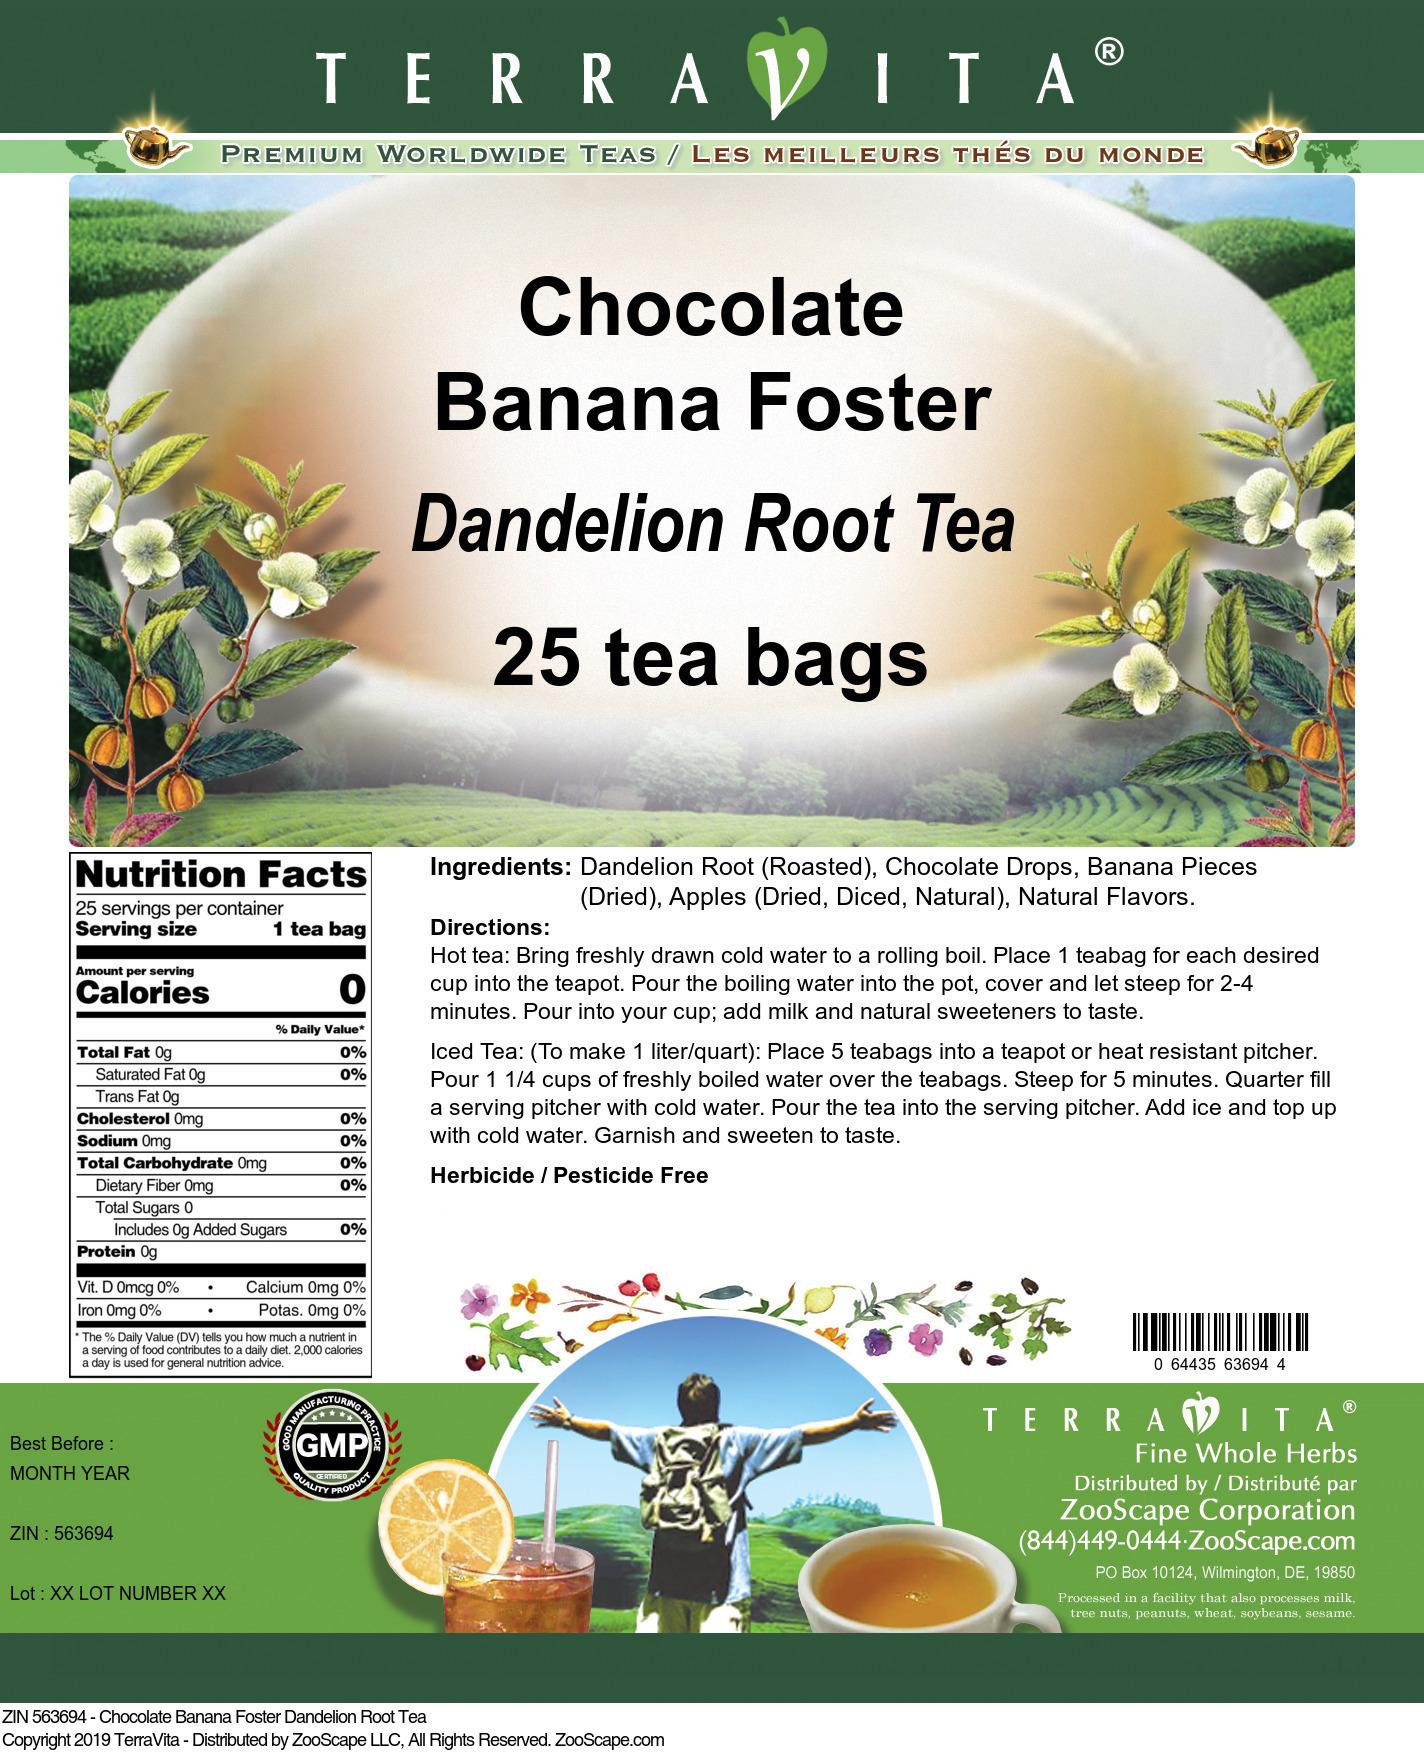 Chocolate Banana Foster Dandelion Root Tea